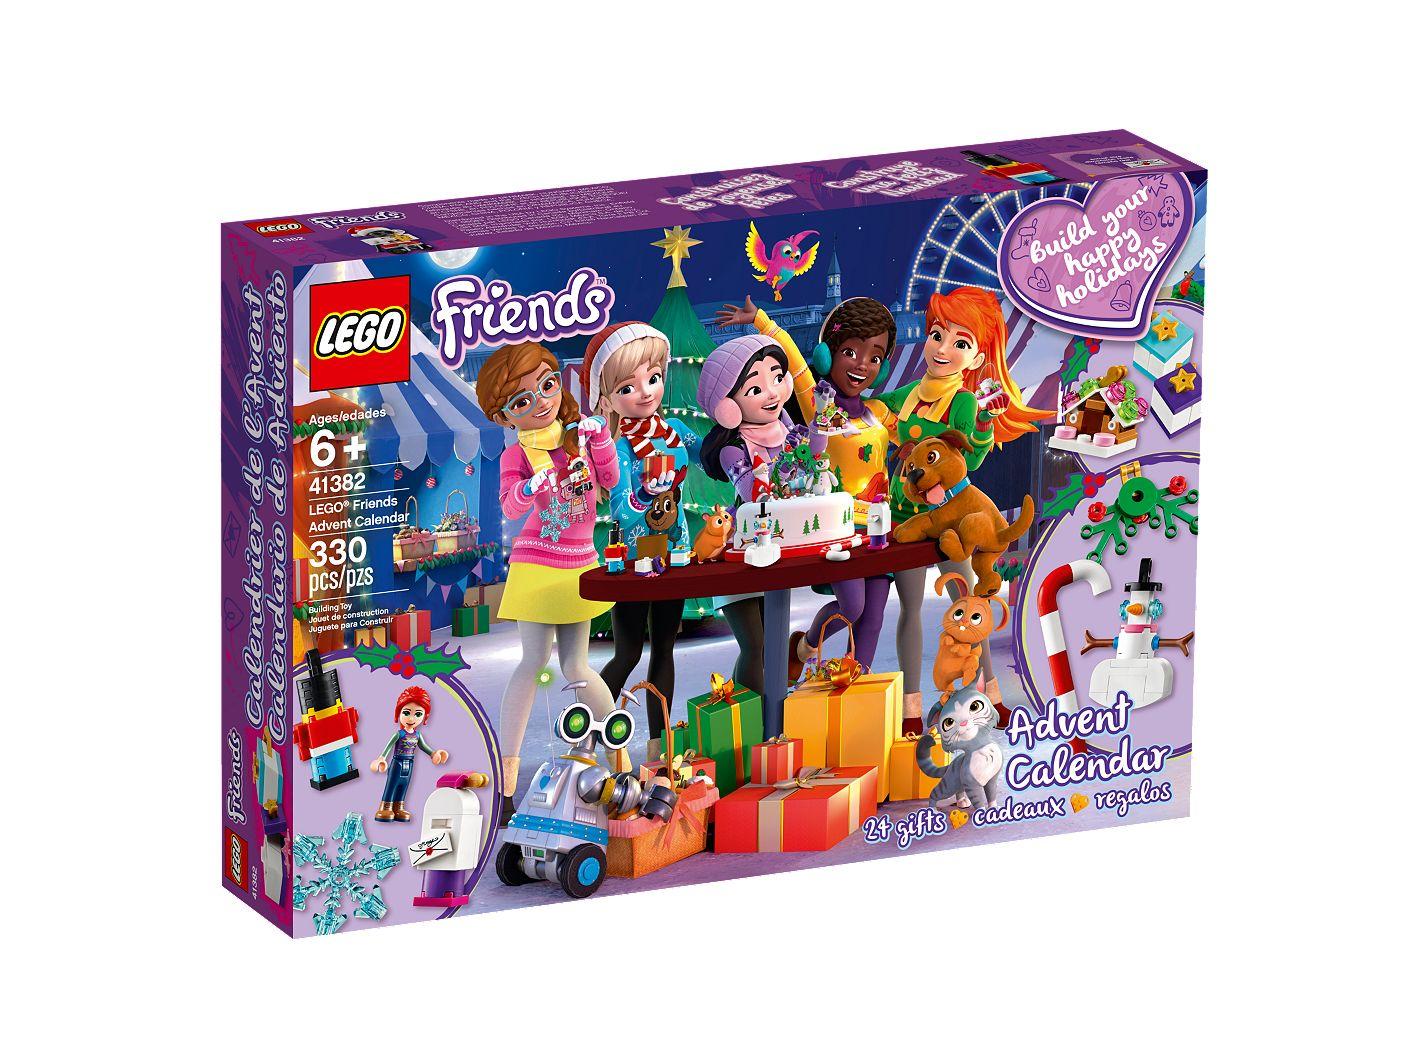 Calendrier De L Avent Lego City 2020.Le Calendrier De L Avent Lego Friends 41382 Friends Boutique Lego Officielle Fr